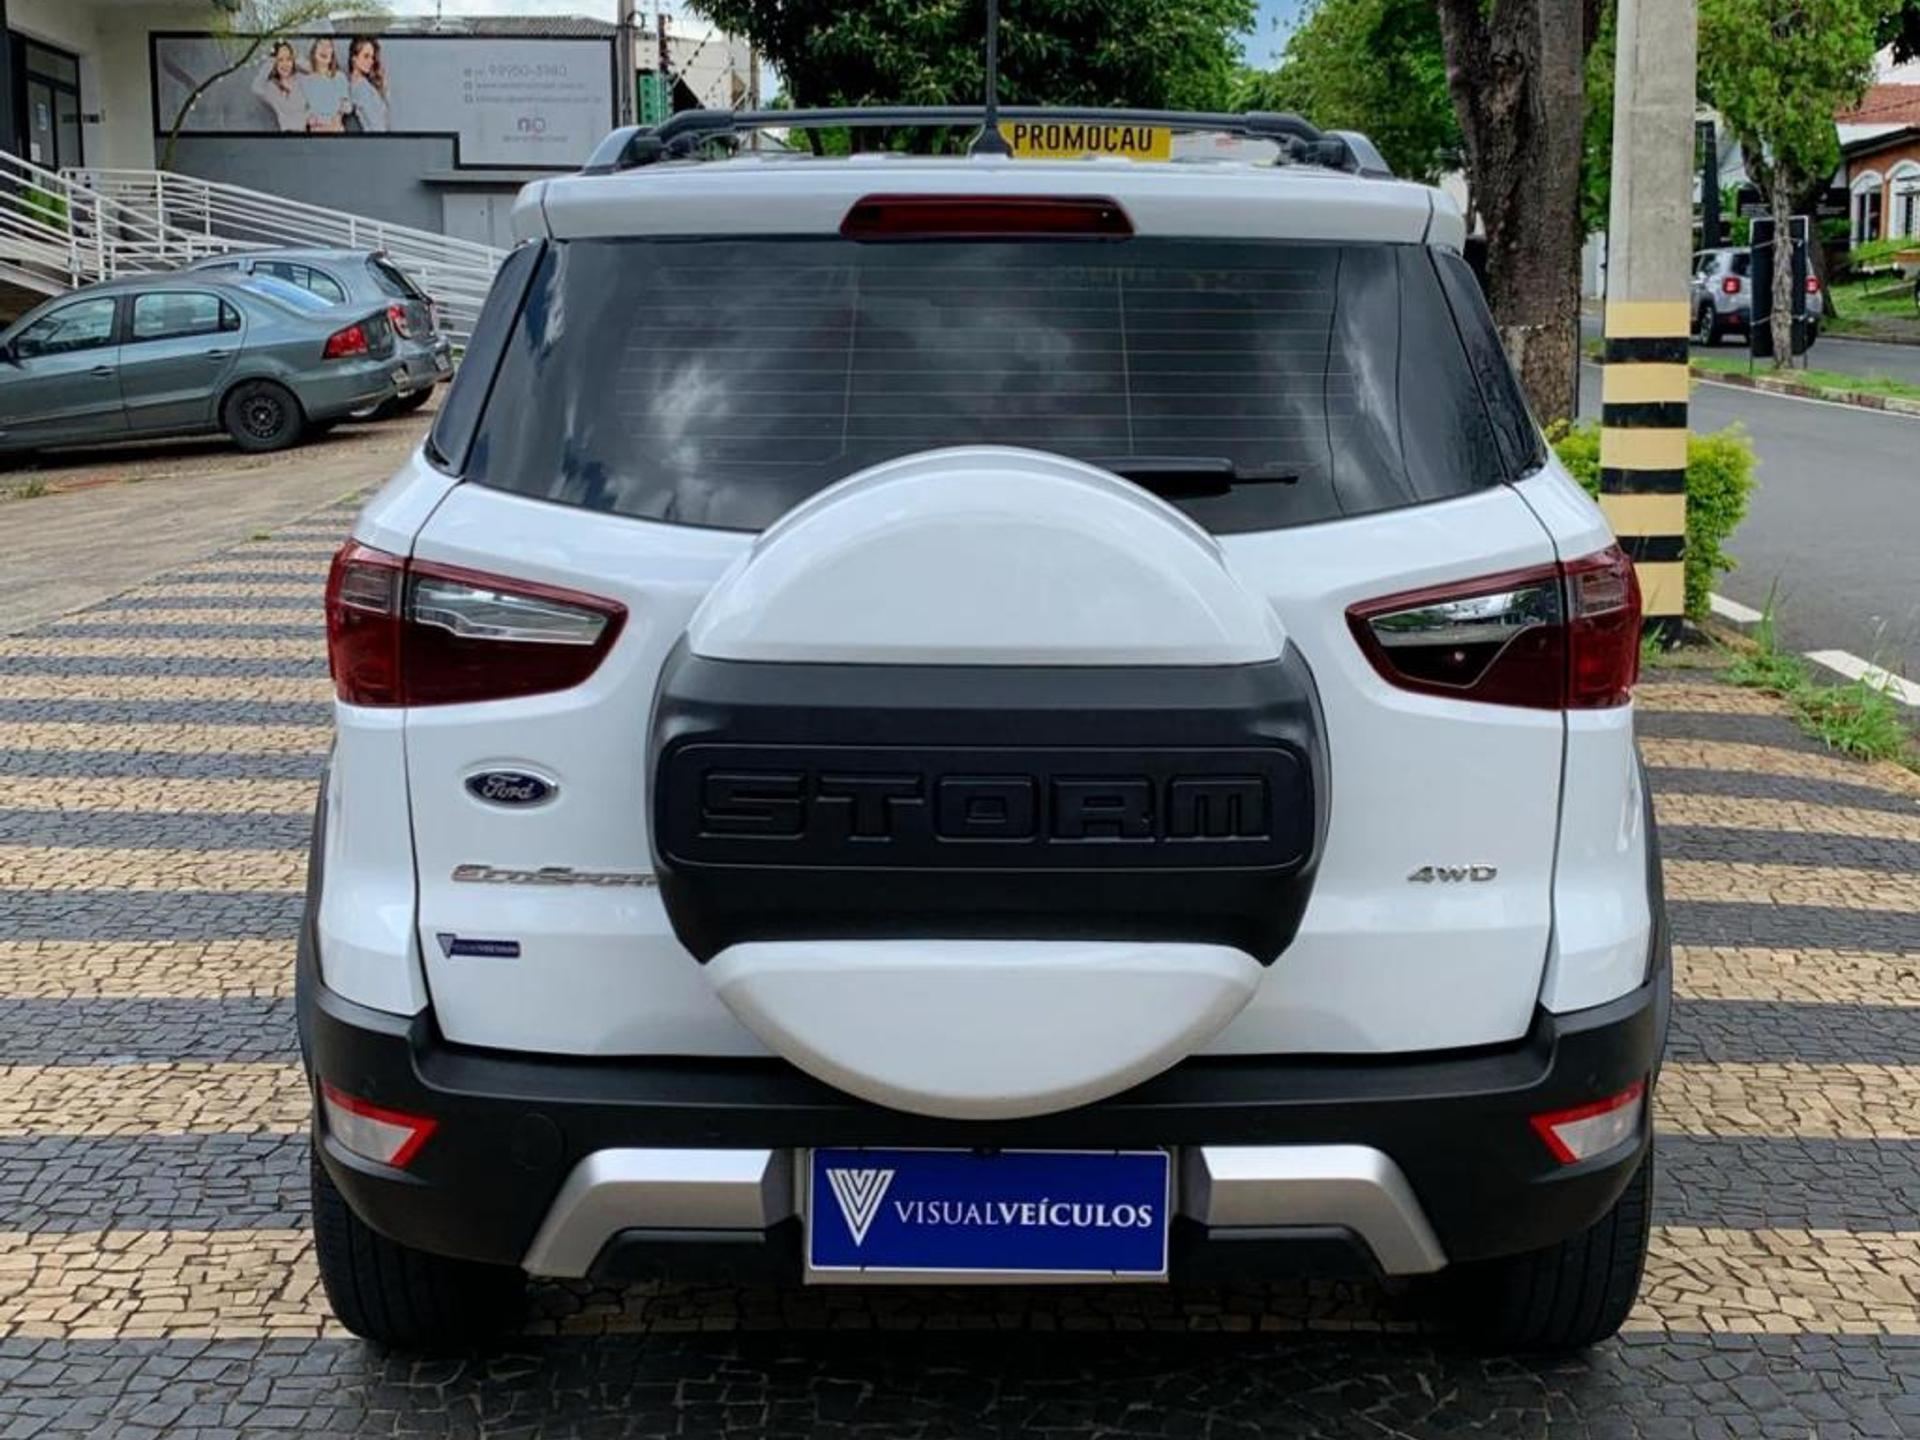 Ford Ecosport 2.0 Direct Flex Storm 4wd Automatico Wmimagem10153675855